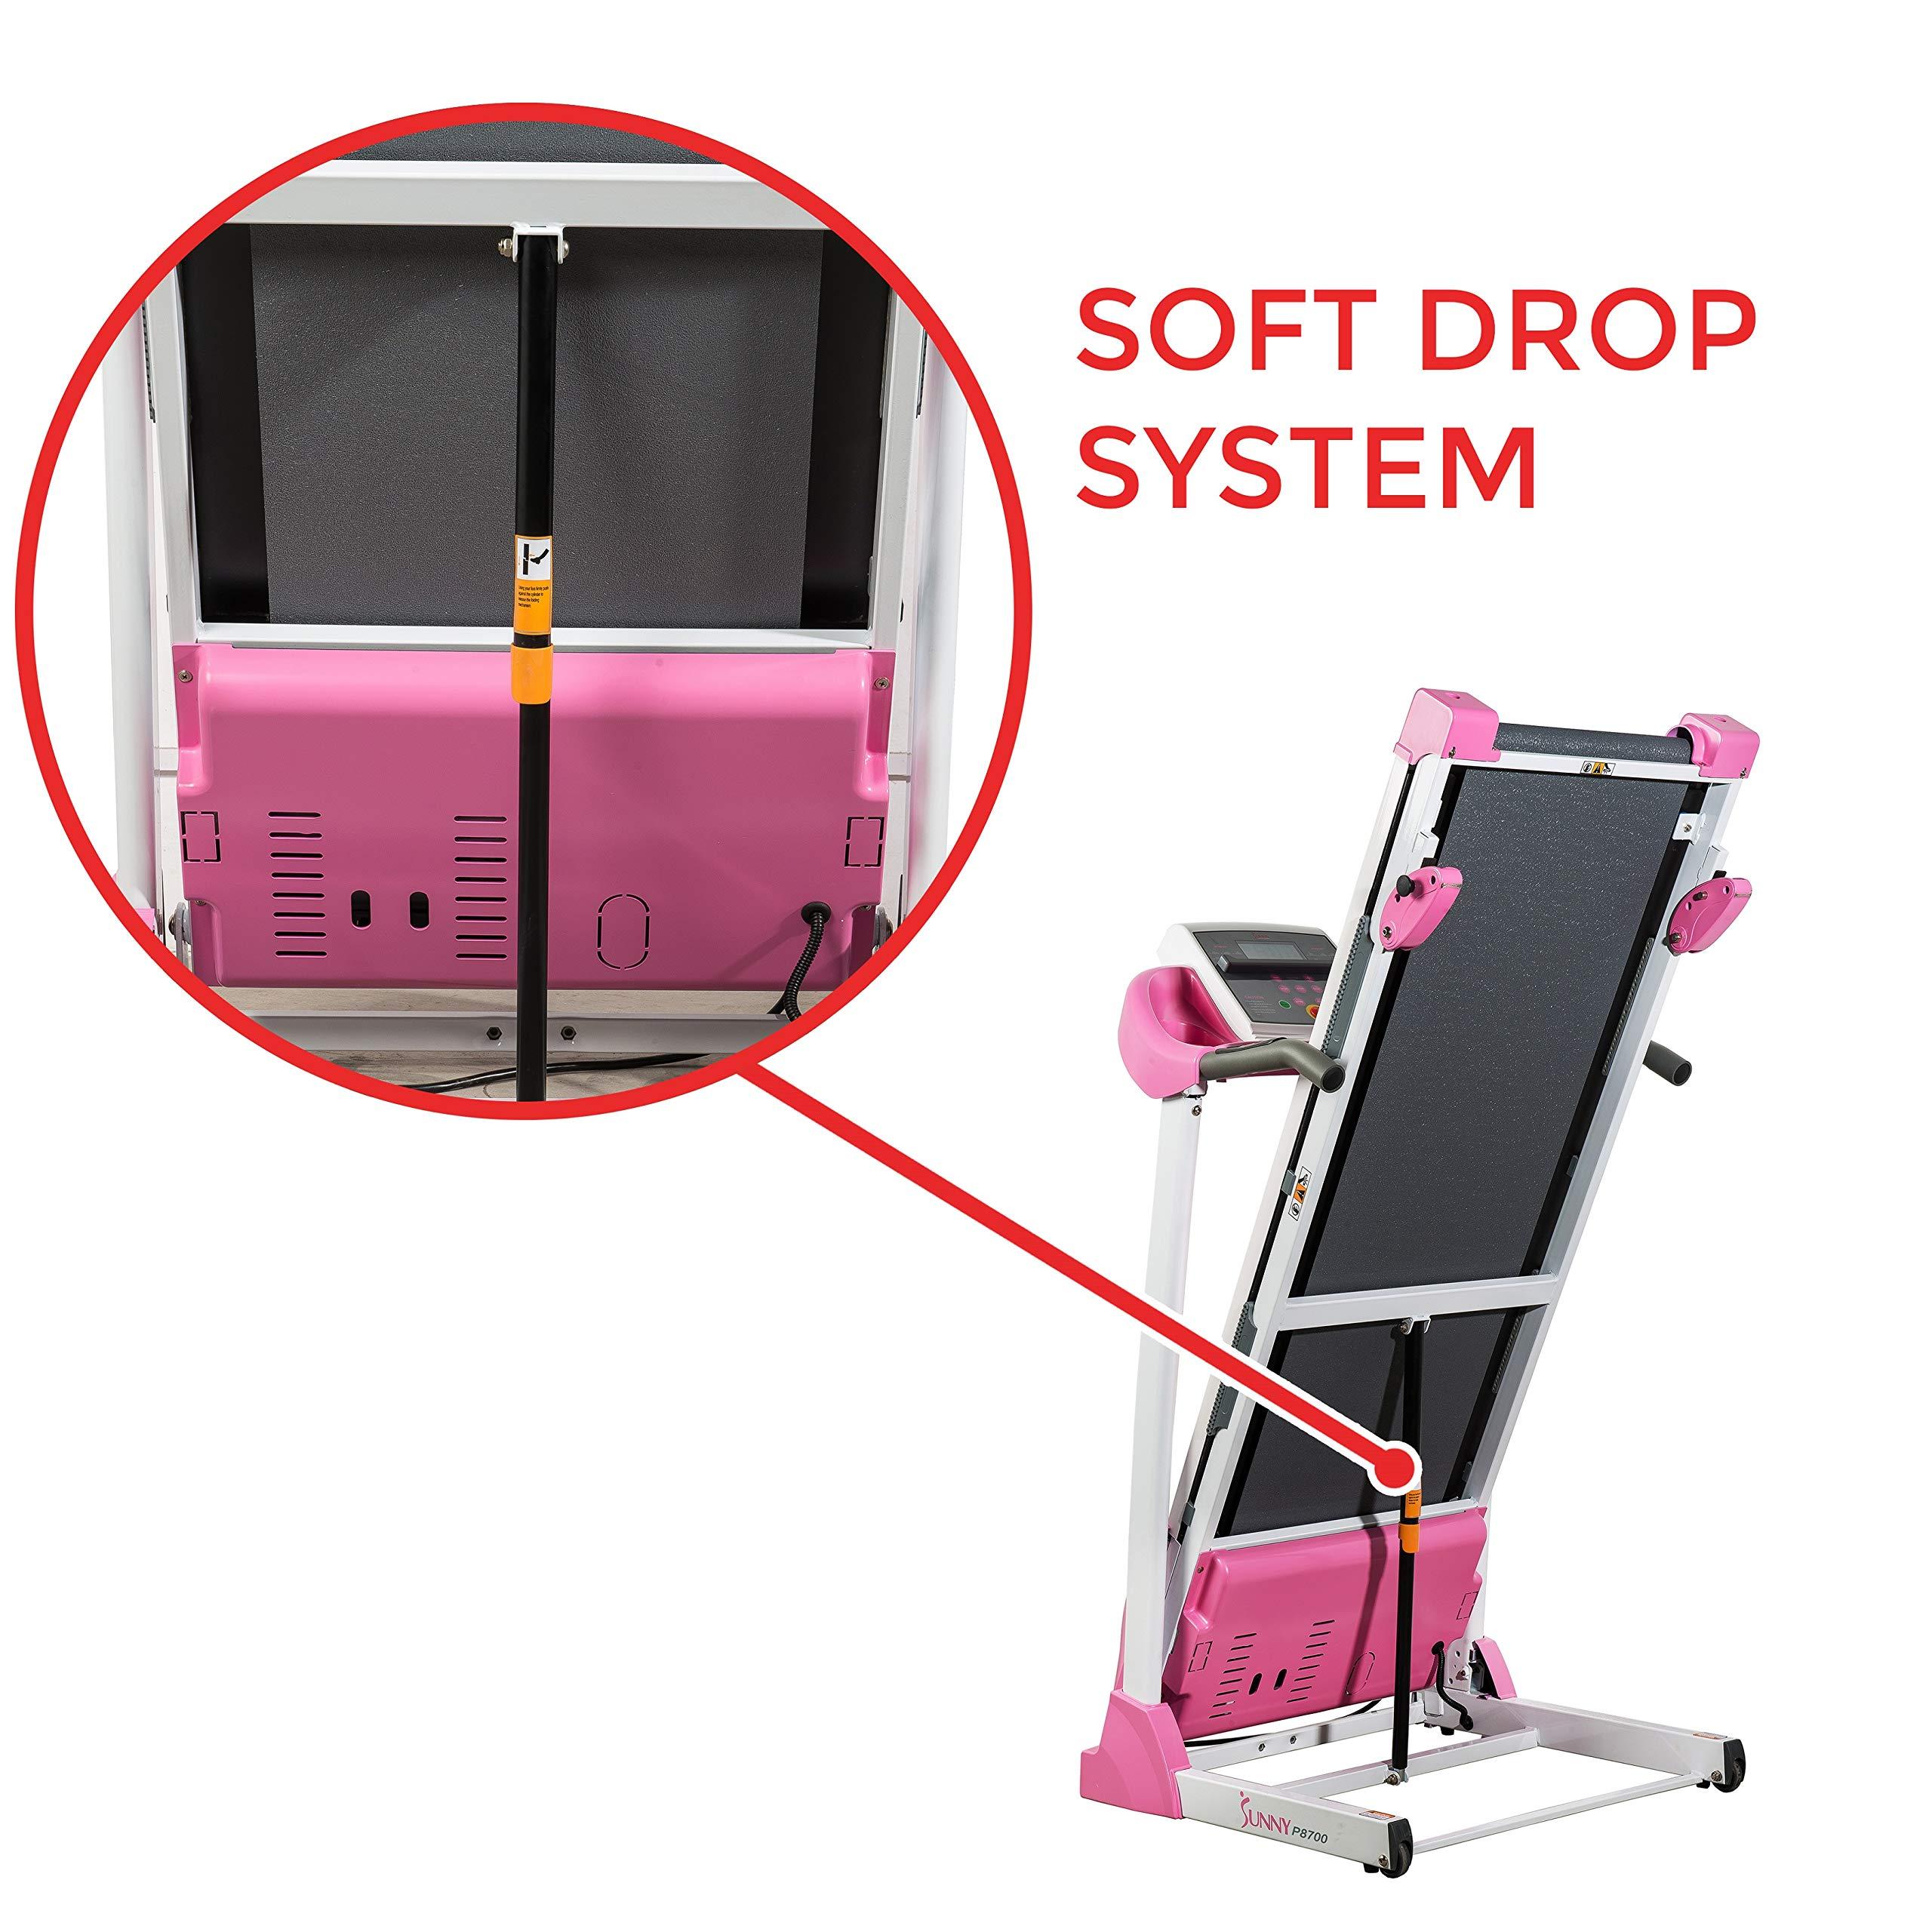 Sunny Health & Fitness P8700 Pink Treadmill by Sunny Health & Fitness (Image #8)